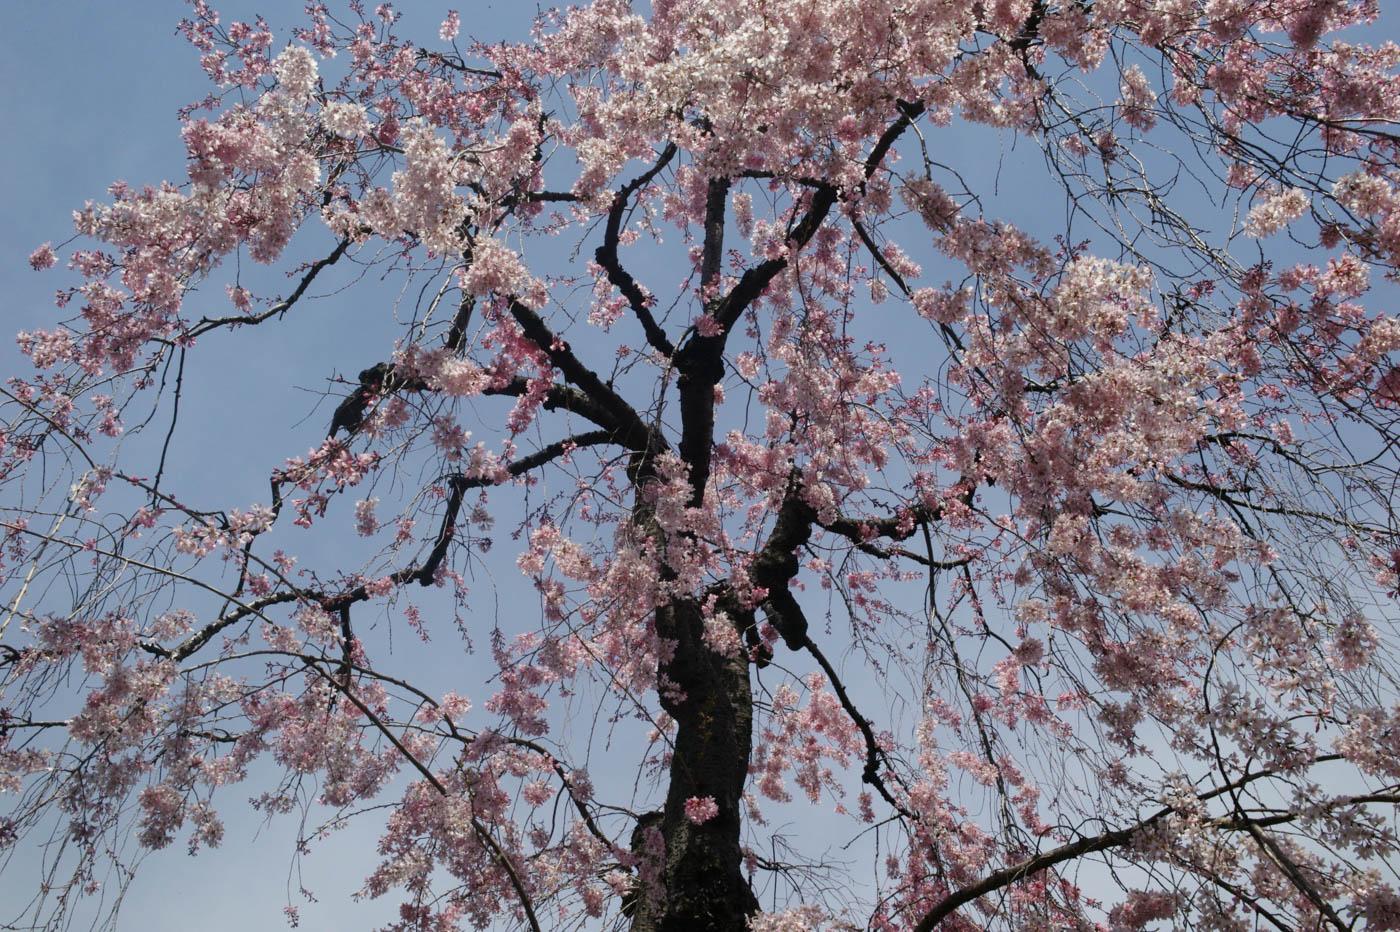 Cherry Blossoms in Jiyugaoka